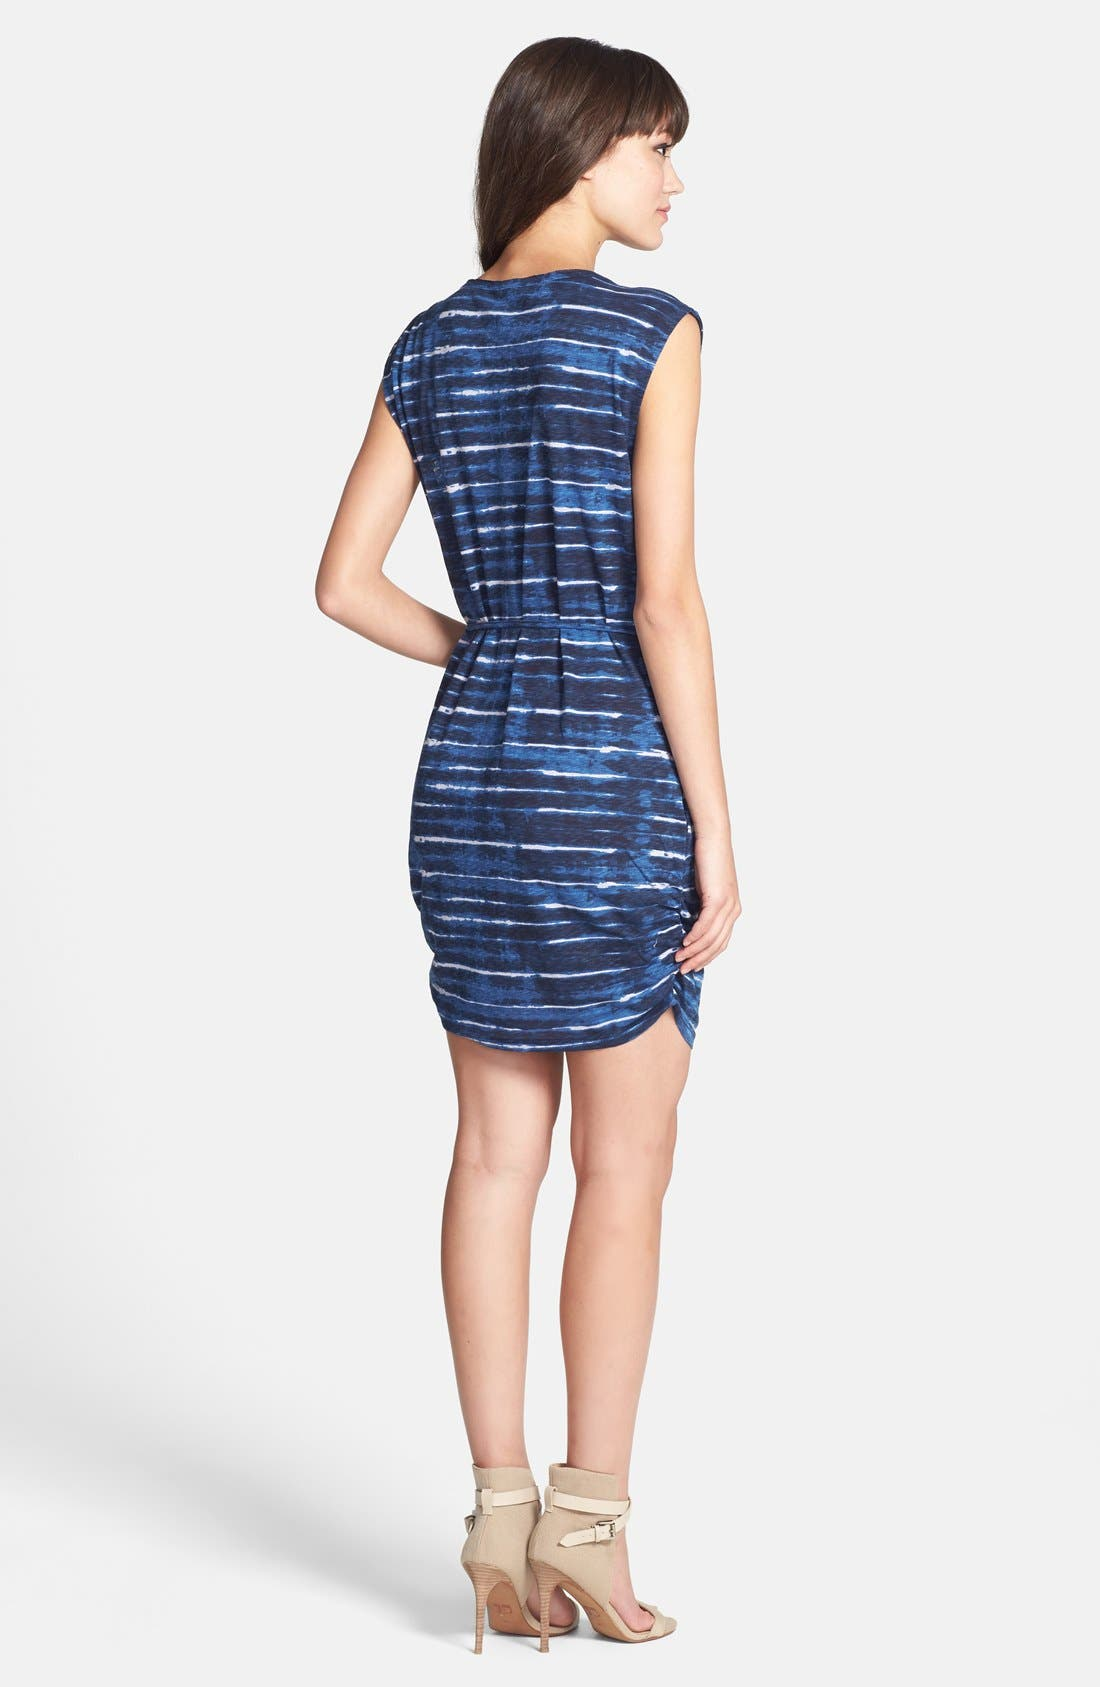 Alternate Image 2  - Soft Joie 'Jute' Tie Dye Cotton Dress